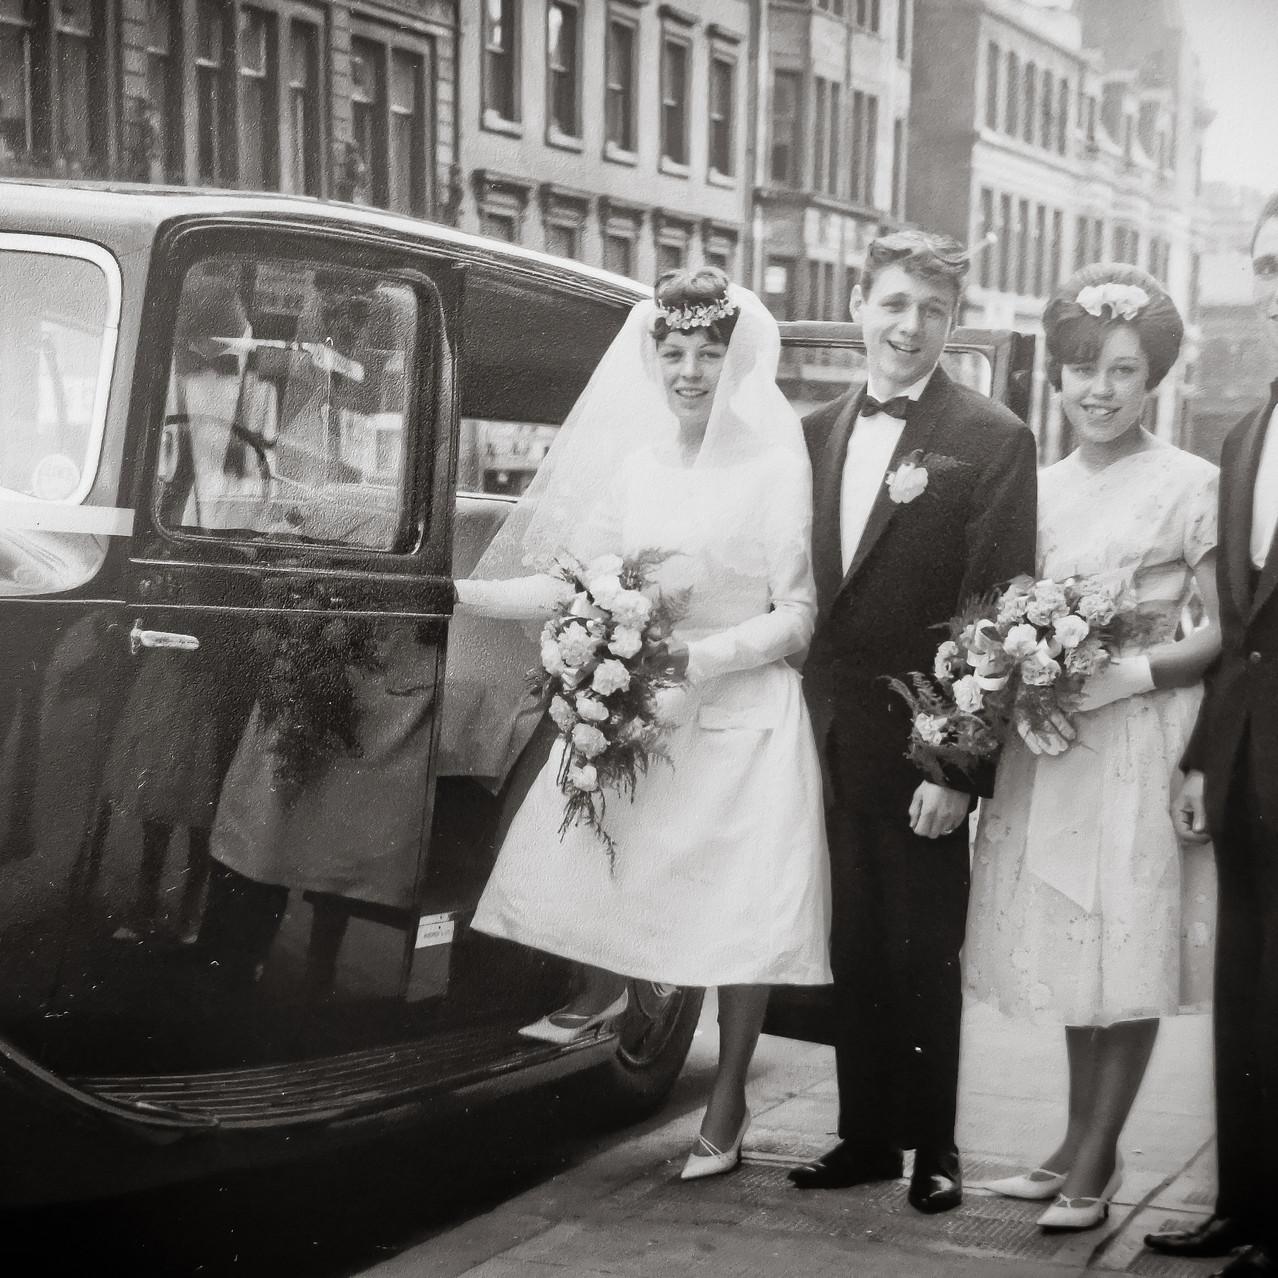 Granny & Grandads Wedding Photos (6 of 6